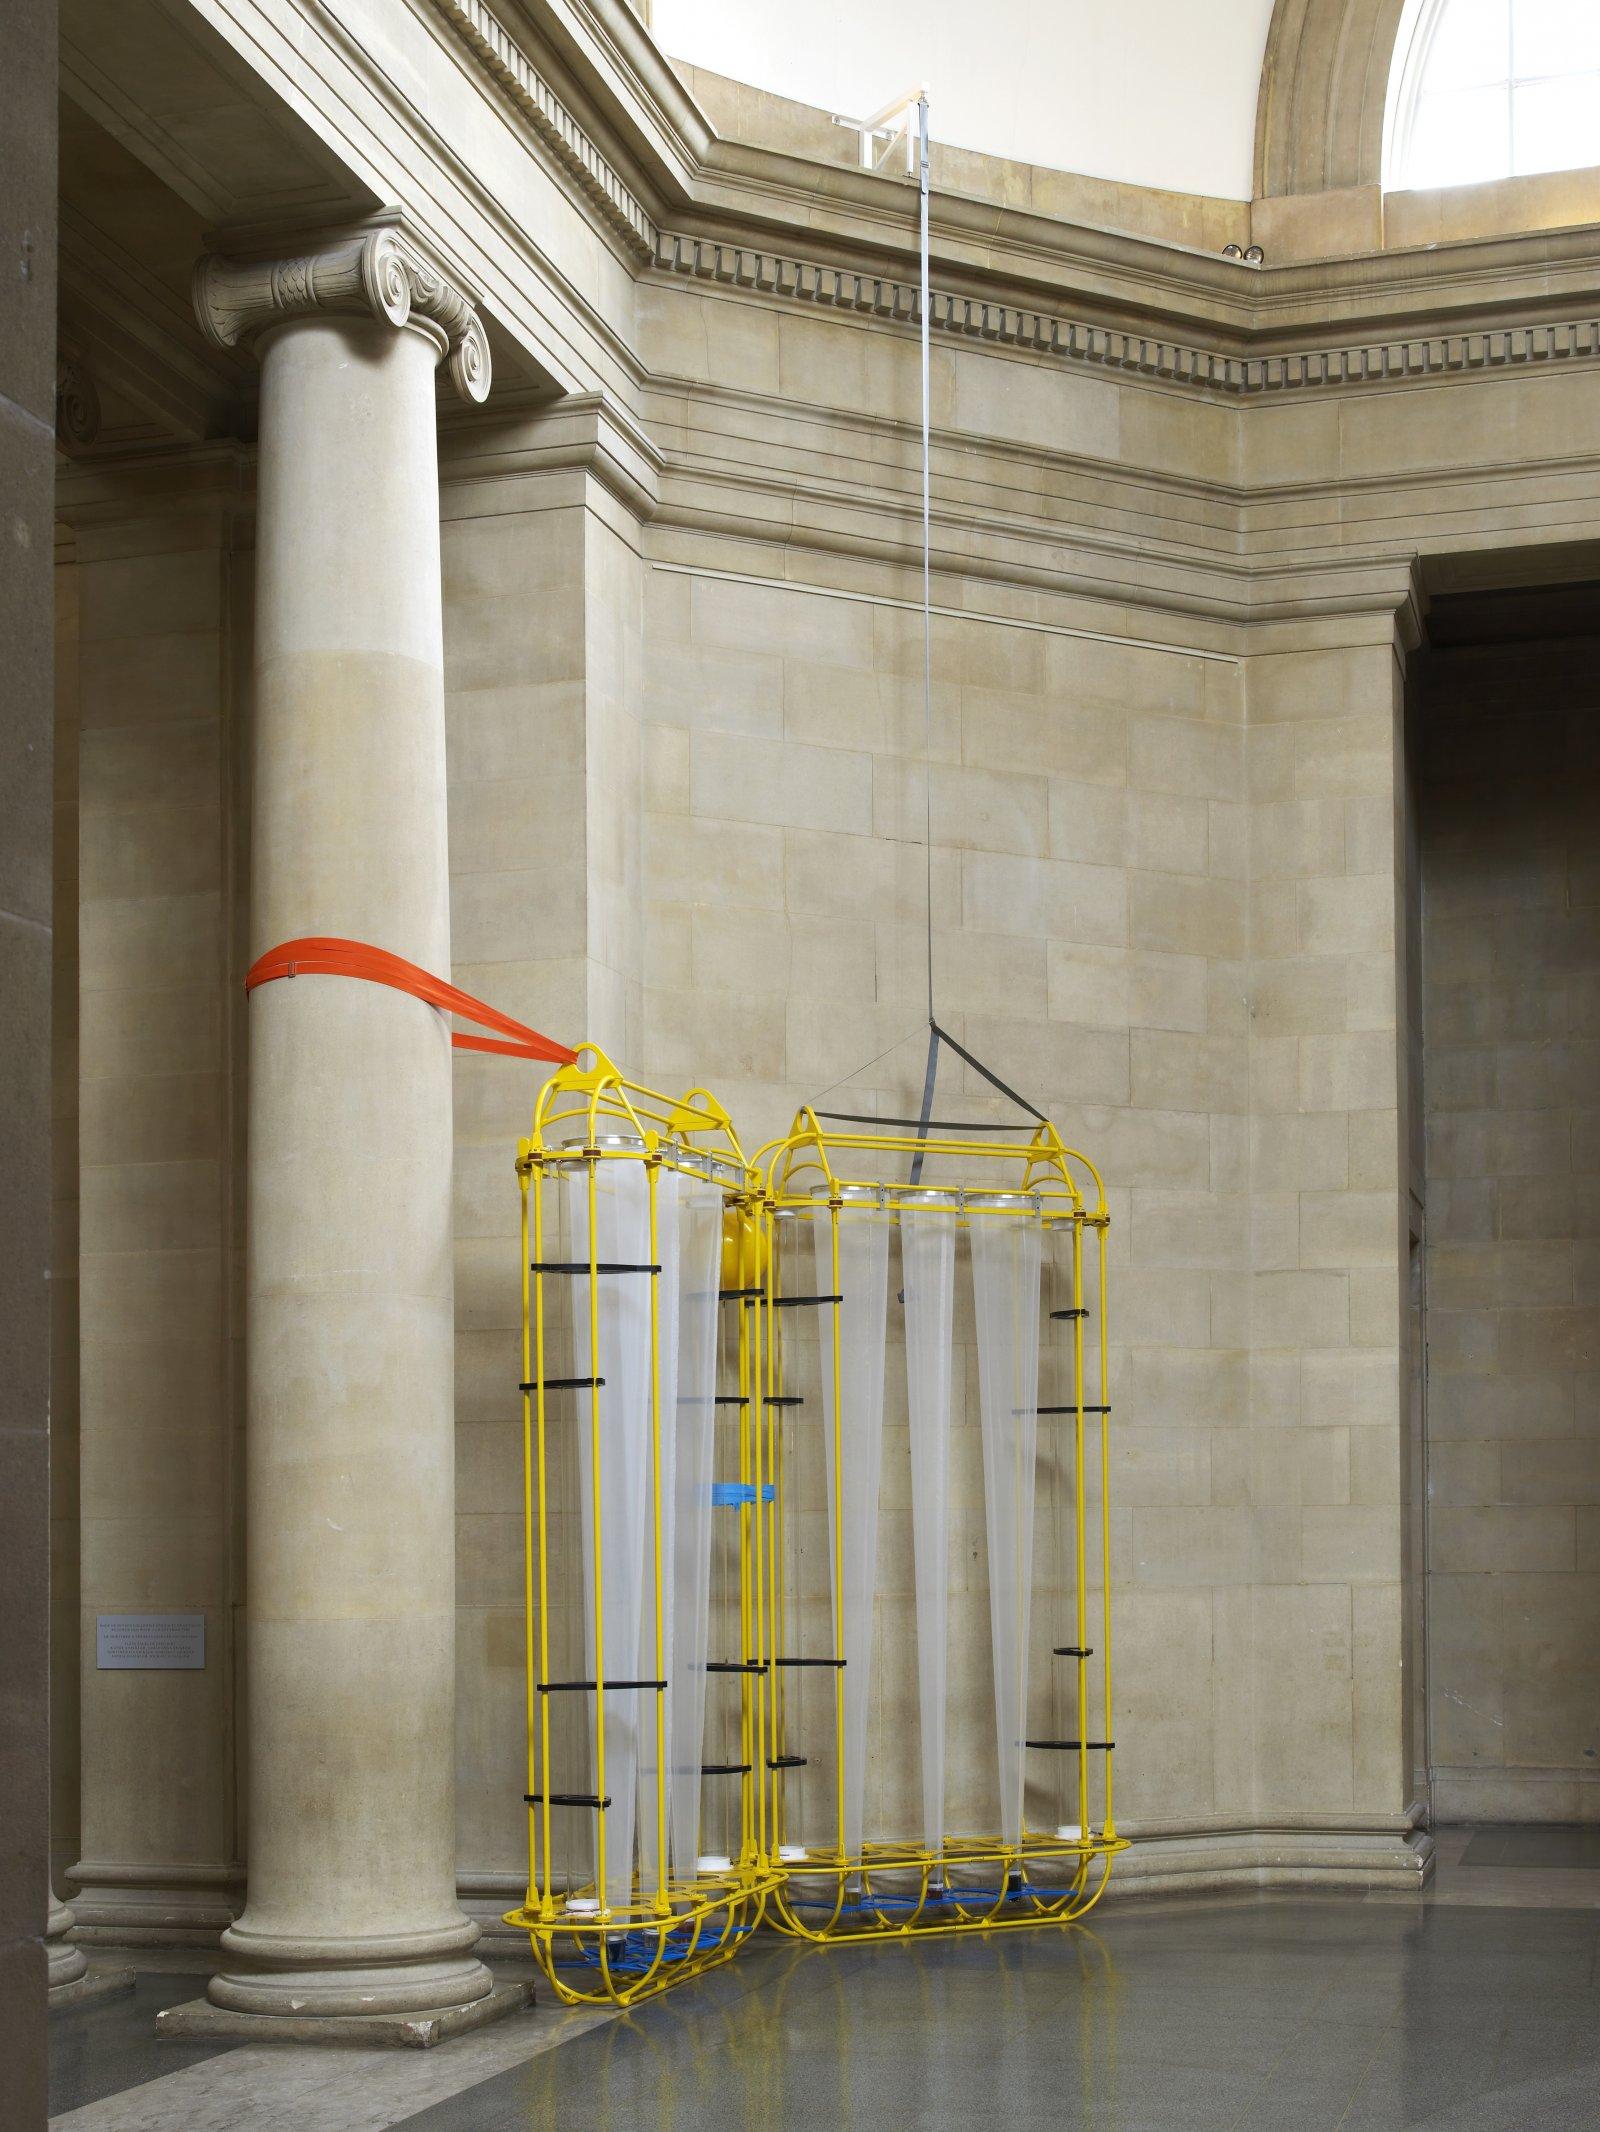 Christina Mackie, The Yellow Machines, 2015, steel, aluminum, acrylic, styrene, copper, stainless steel, nylon webbing, polyethylene, nylon, resin, rubber, 128 x 160 x 32 in. (326 x 406 x 80 cm) by Christina Mackie